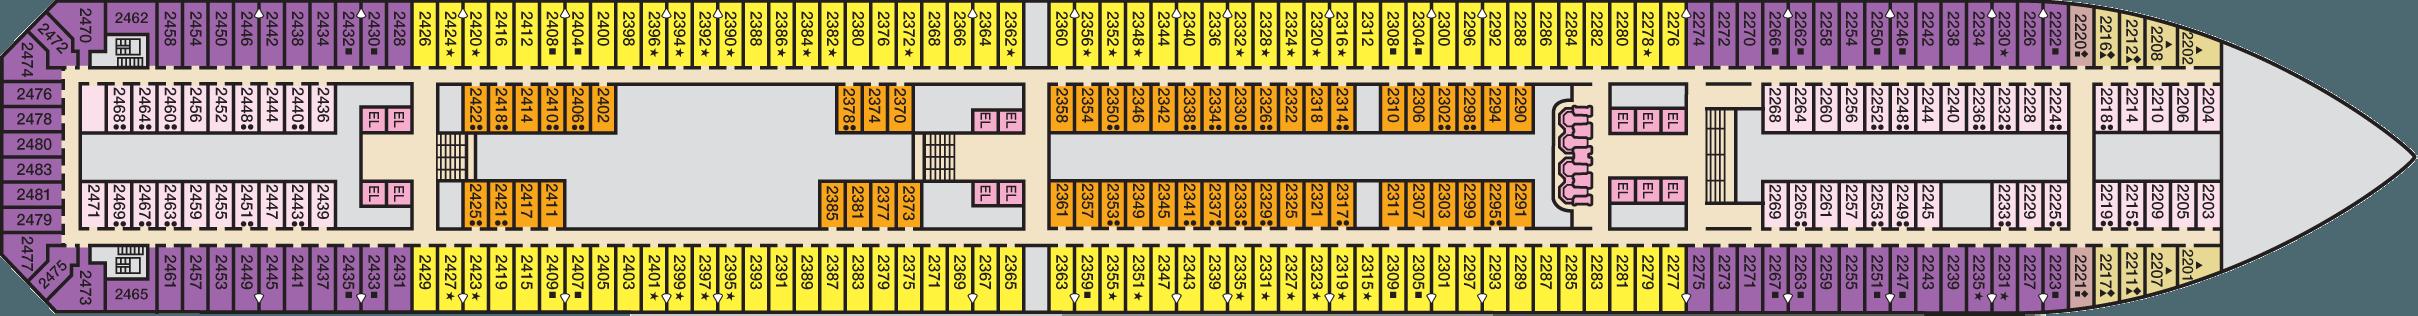 Deck 2